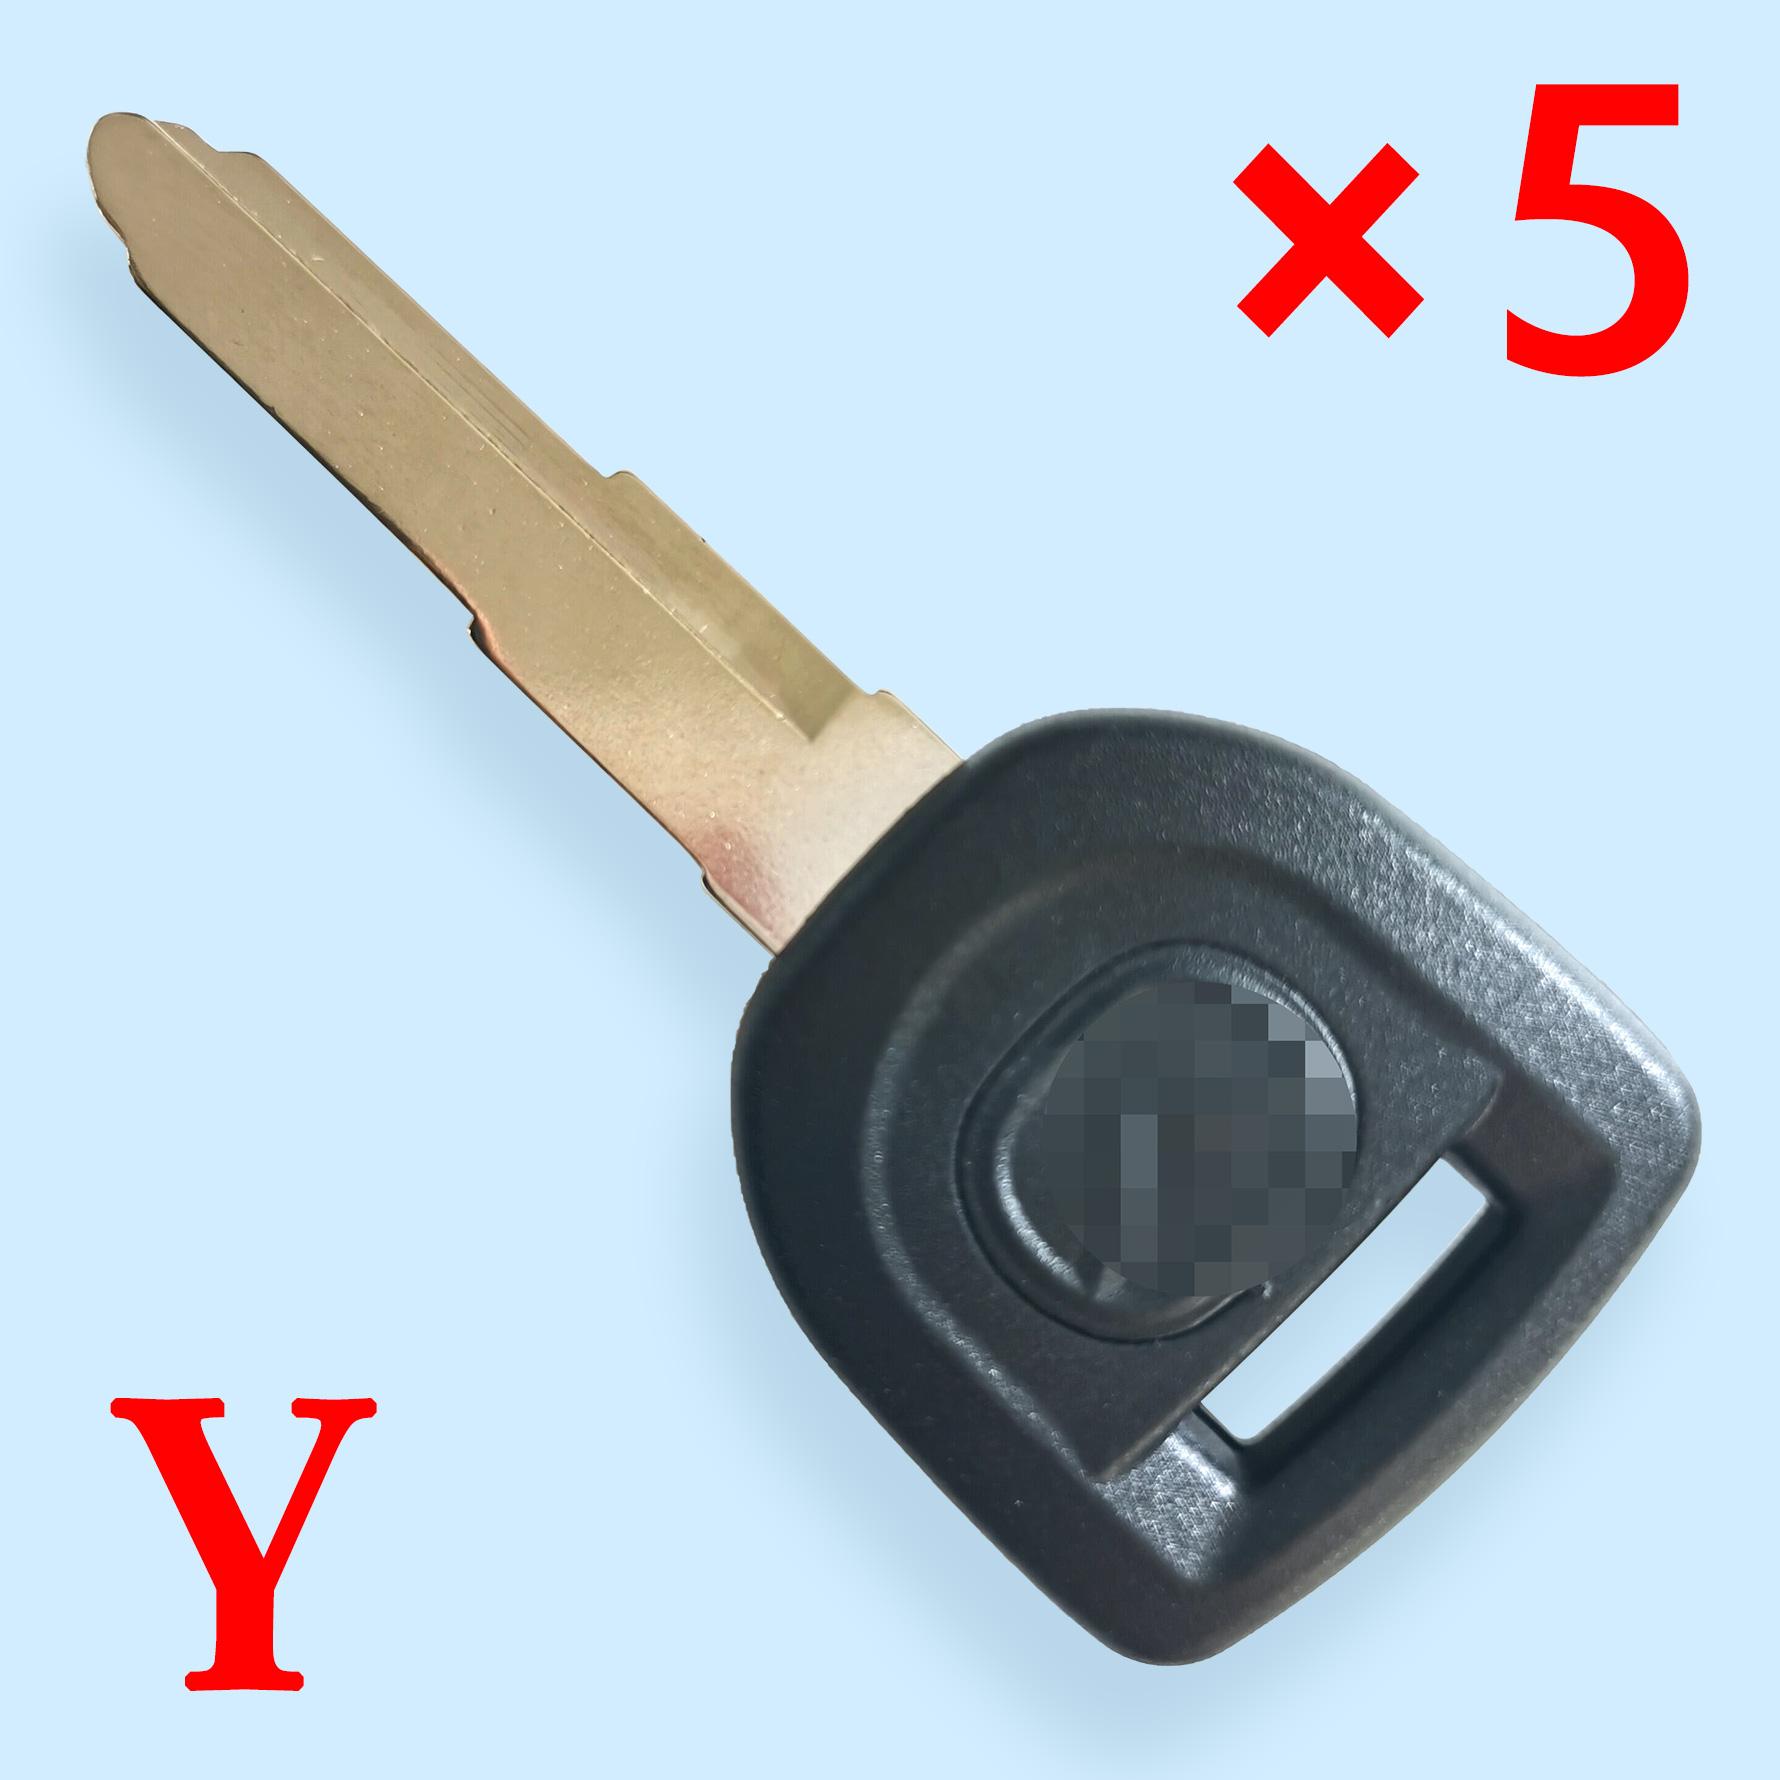 MAZ24R Transponder Key Shell for Mazda - Pack of 5